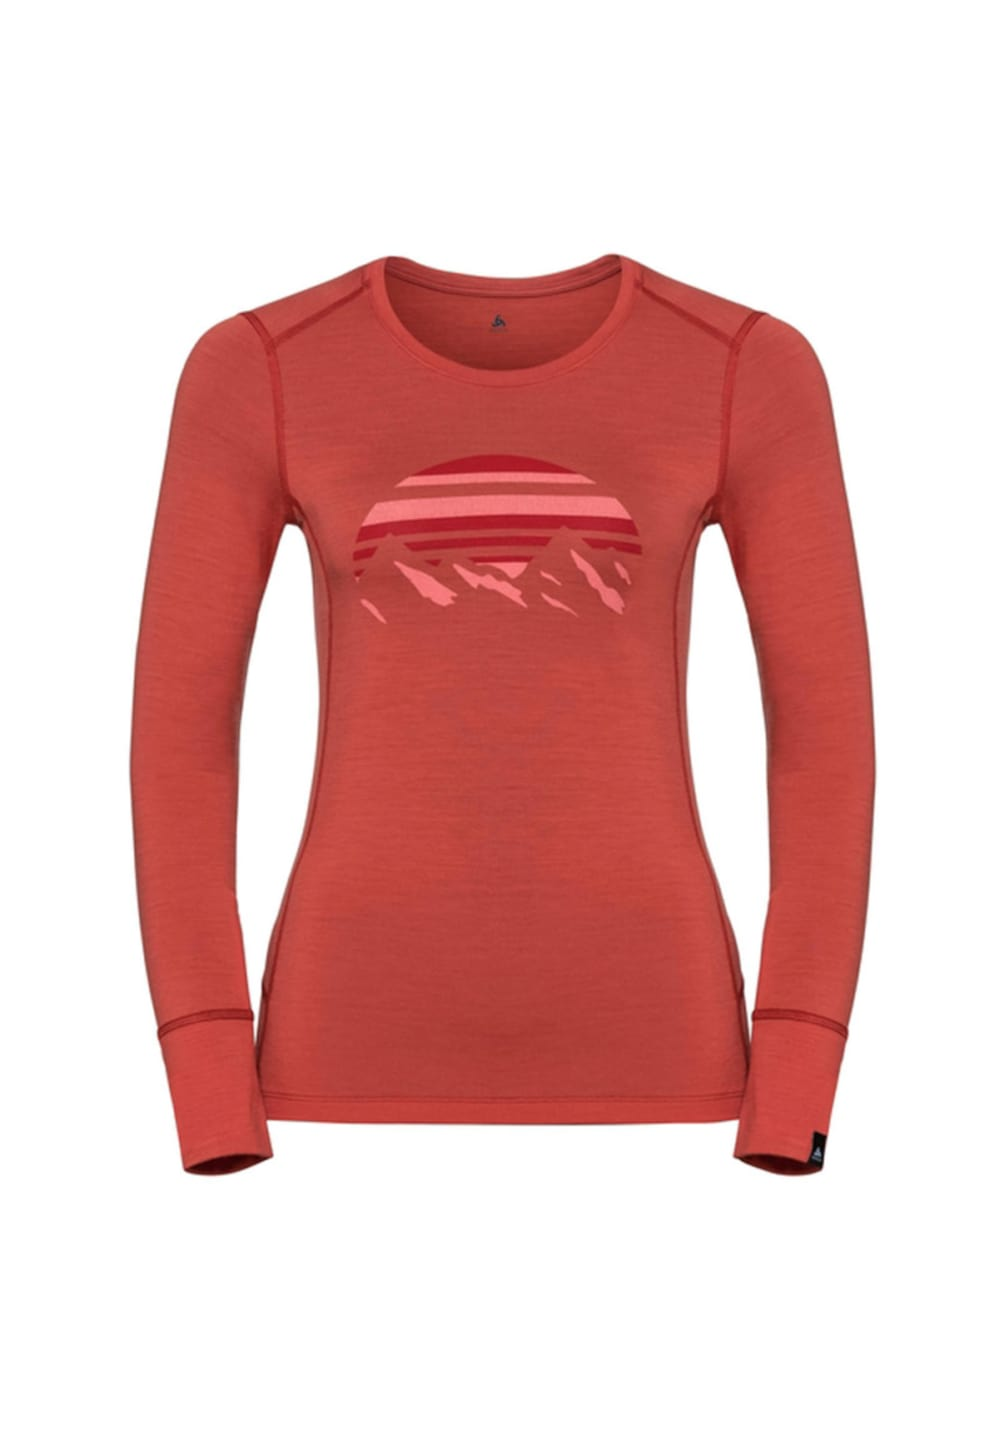 Odlo Top Crew Neck Long Sleeve Alliance - Laufshirts für Damen - Rot